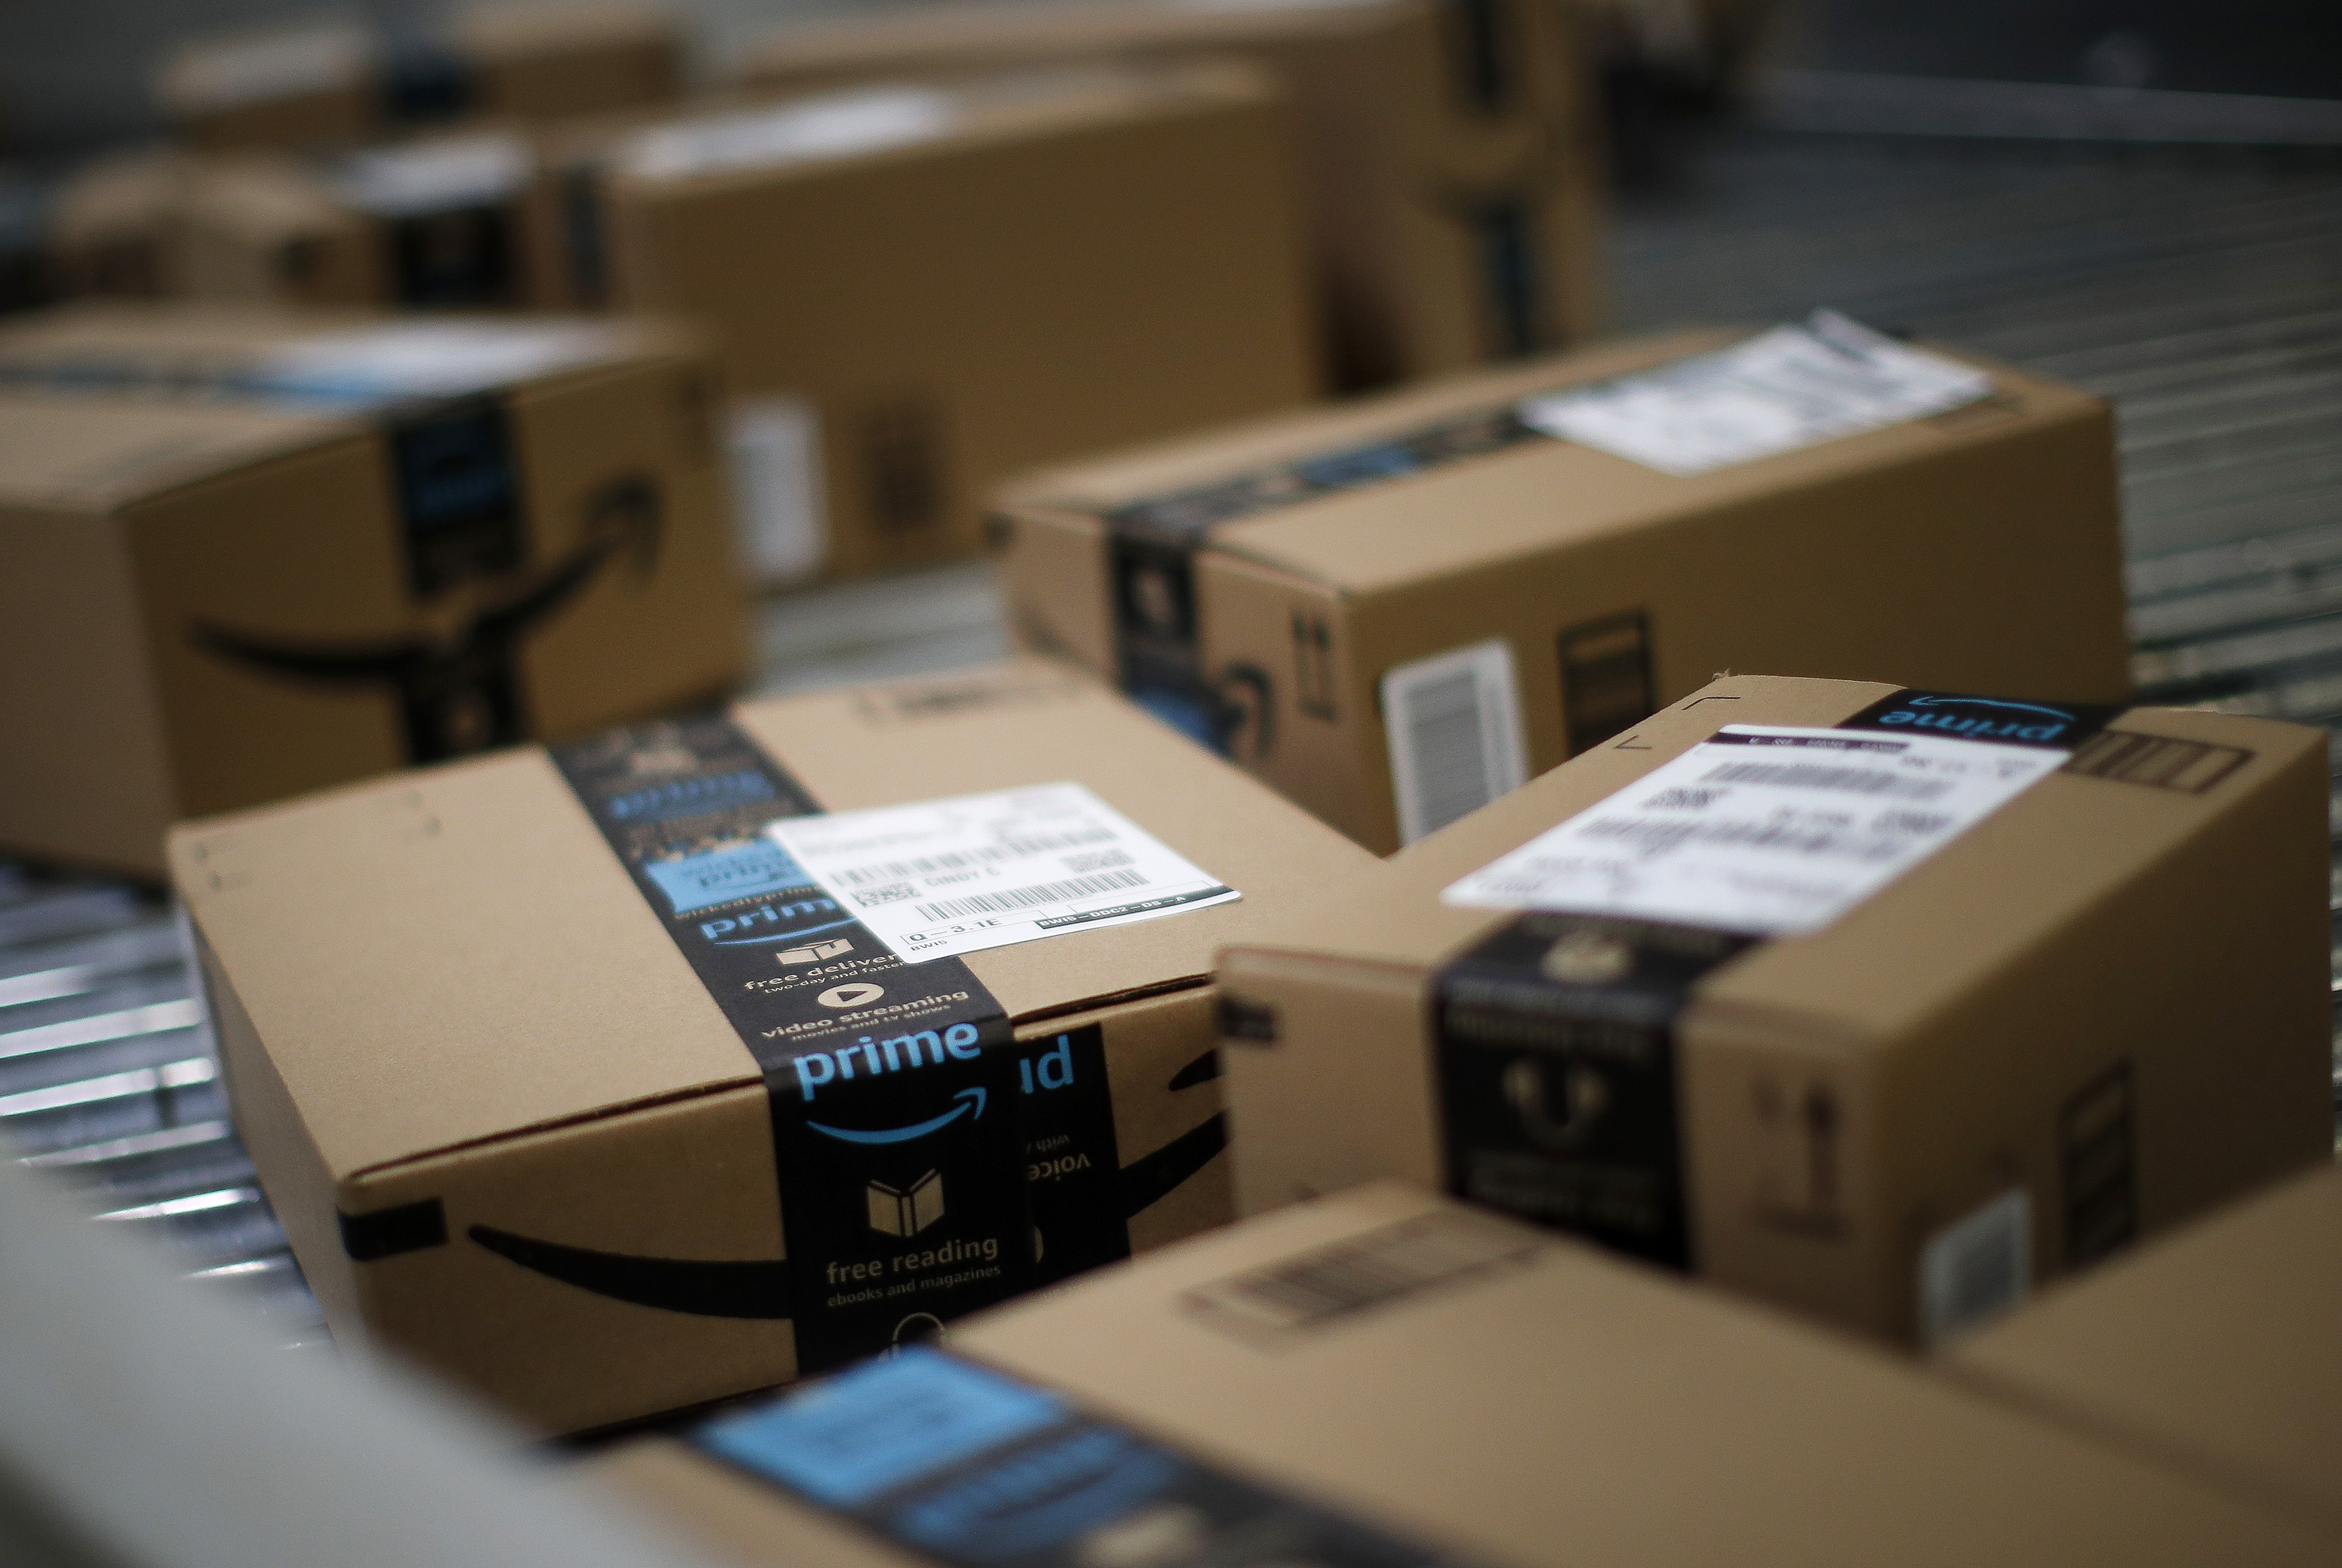 Inside An Amazon.com Fulfillment Center As Company Holds Giant Job Fairs